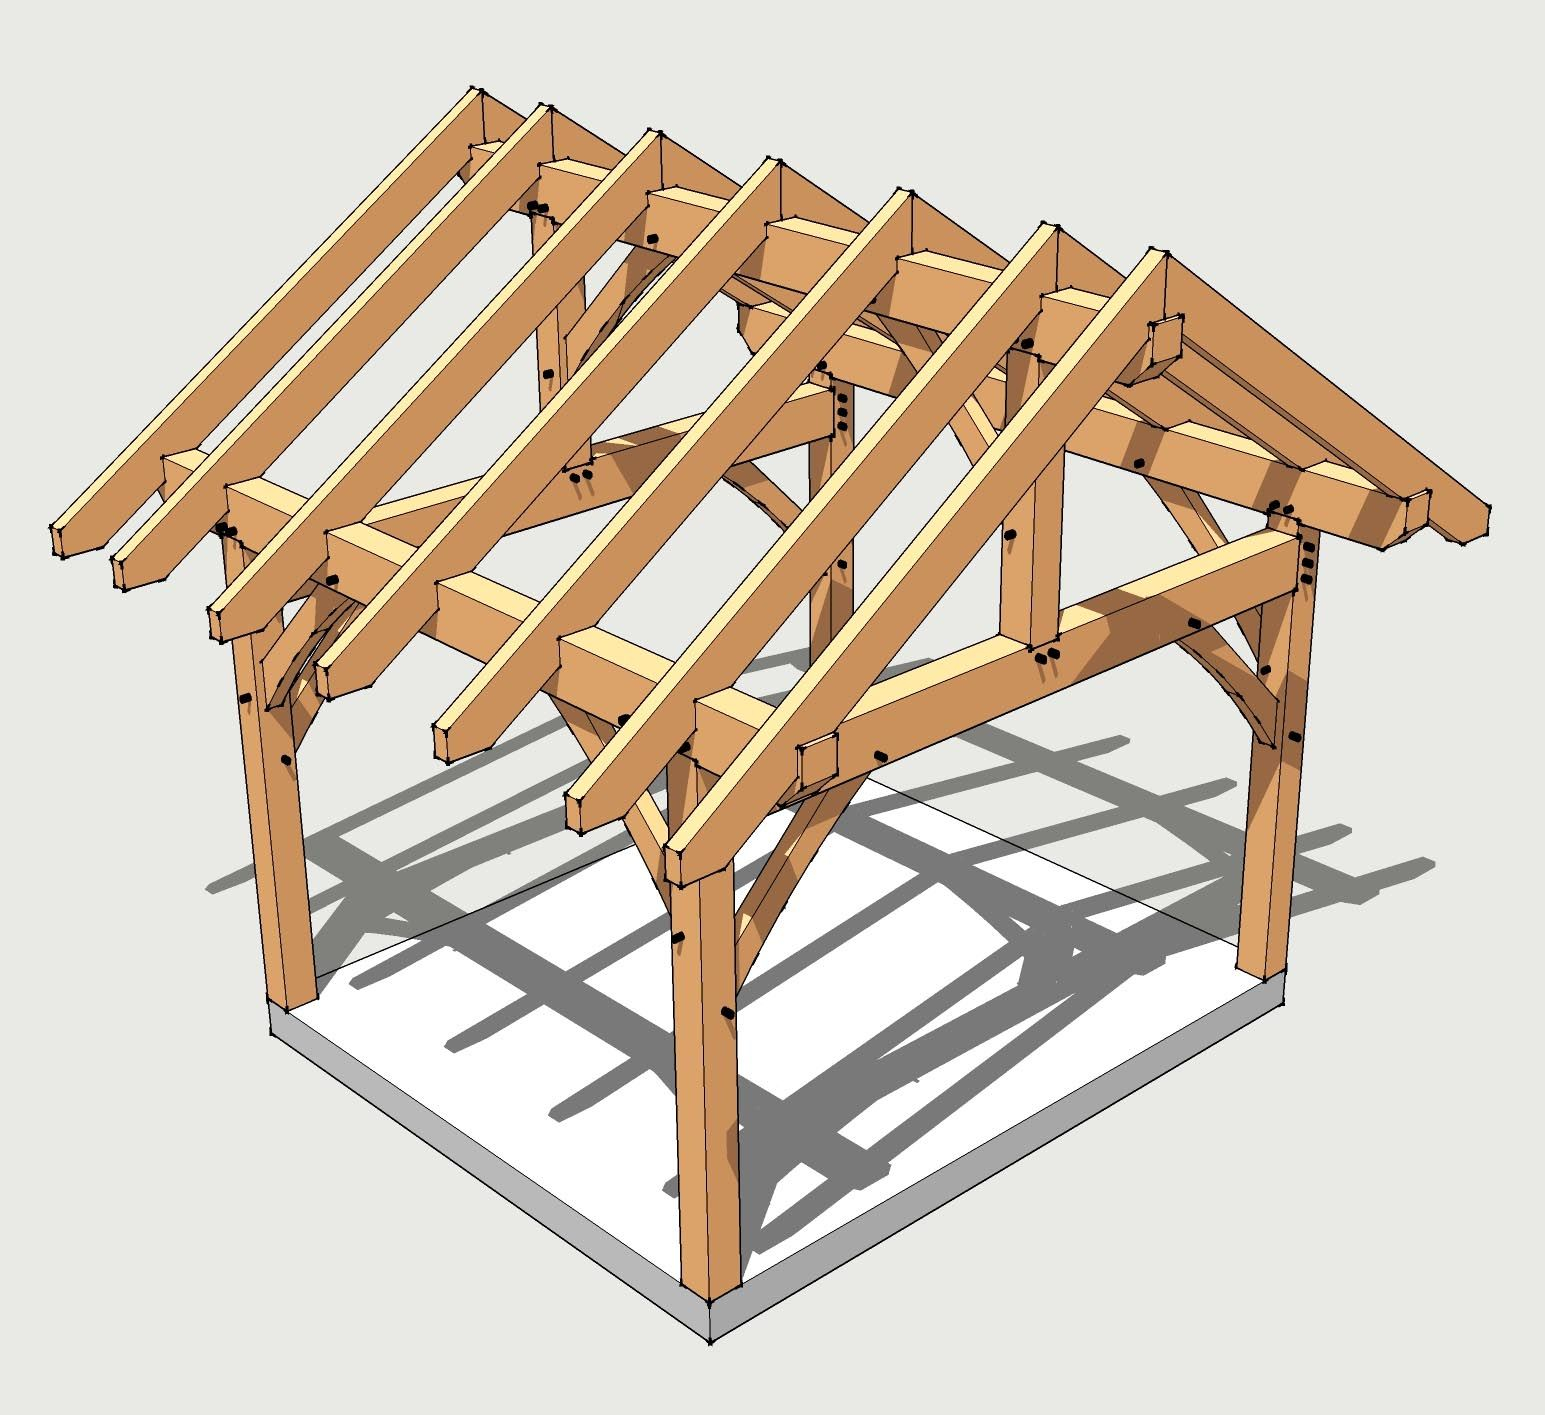 Square Gazebo Plans 12x12 Gazebo Plans Timber Frame Homes inside dimensions 1545 X 1415